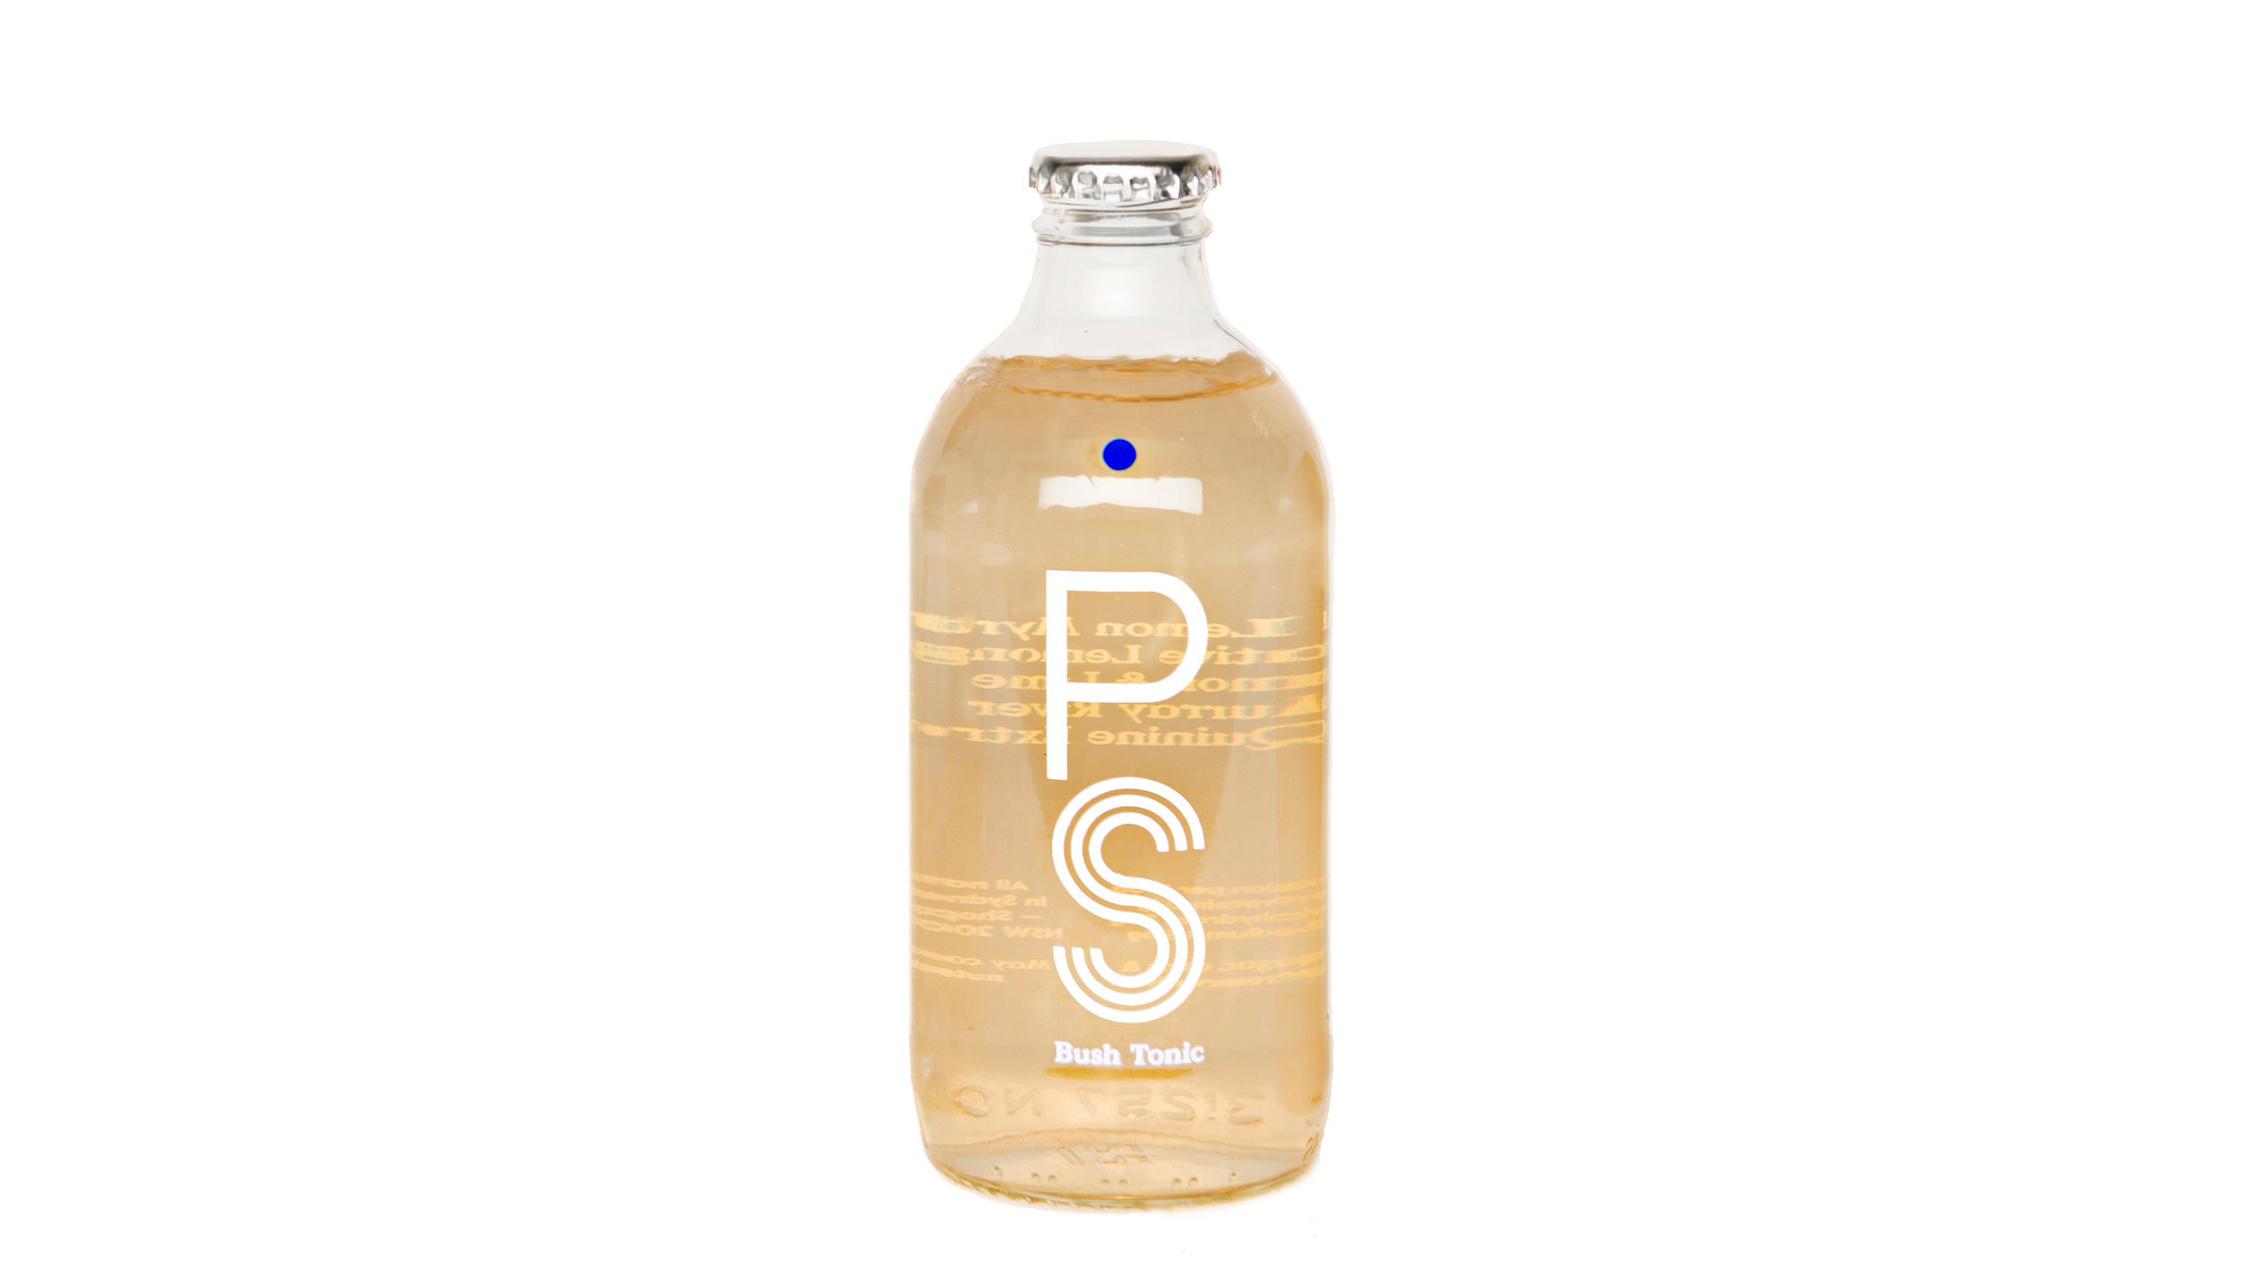 Ps40 soda Bush tonic flavour